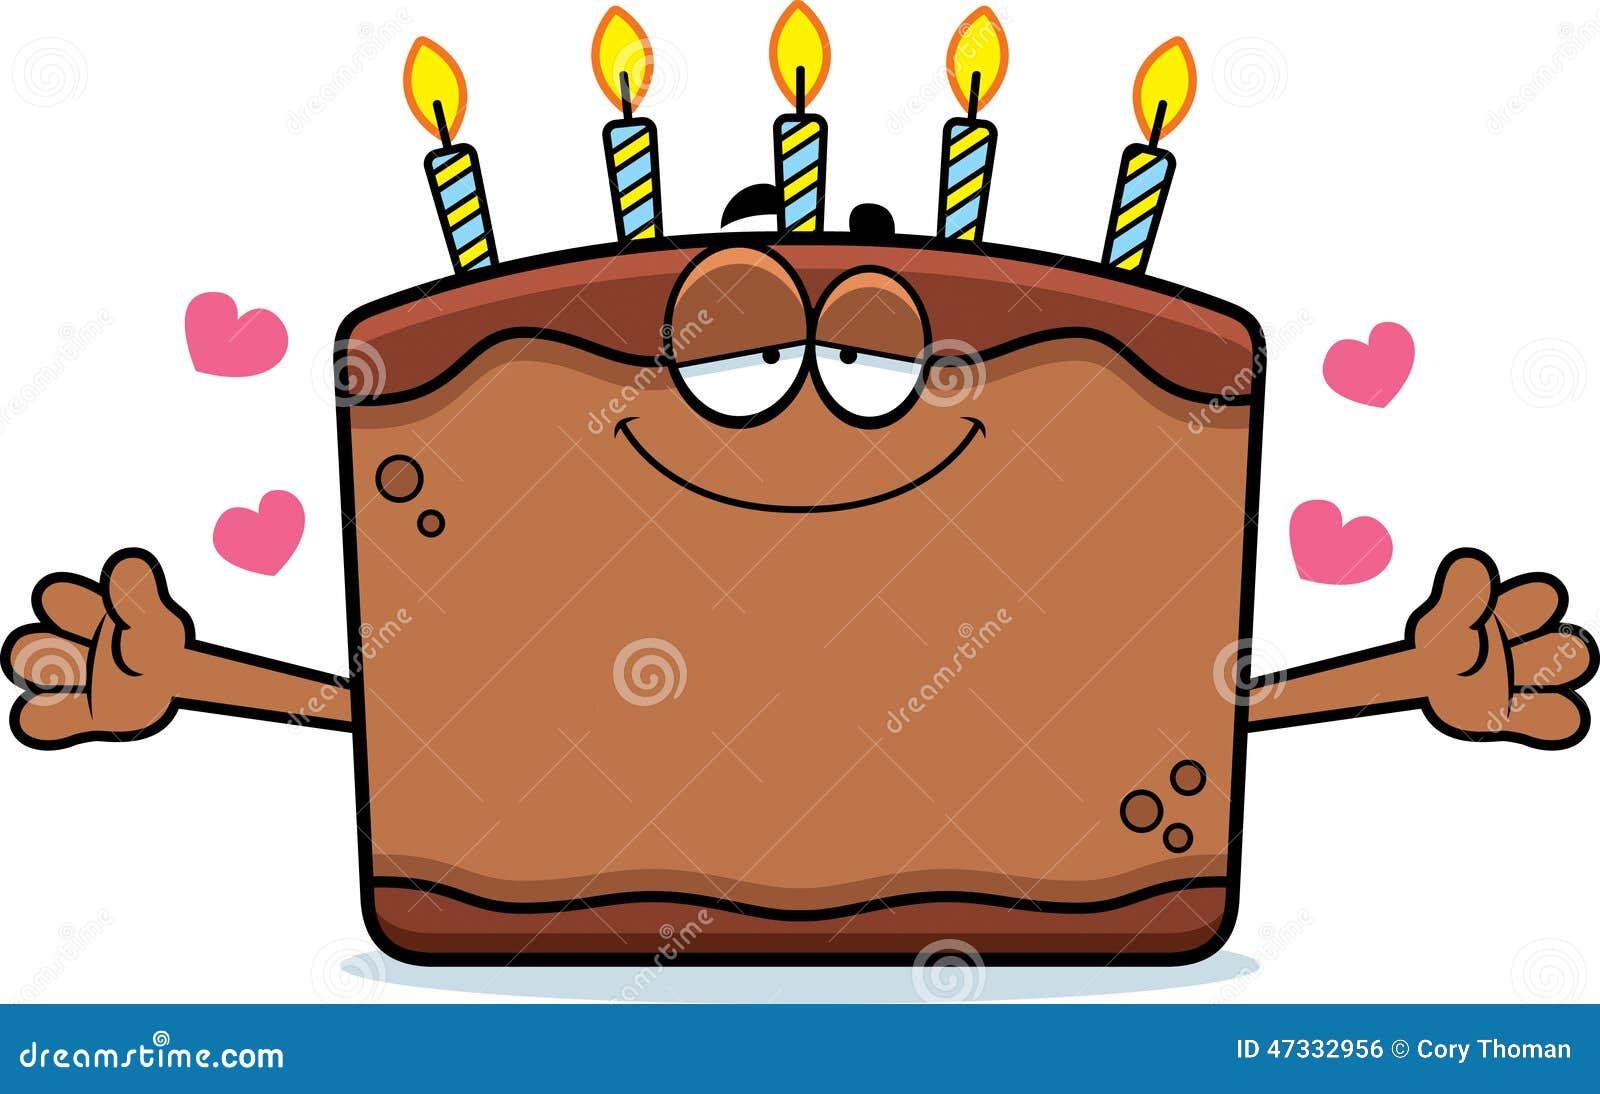 Cartoon Birthday Cake Hug Stock Vector Illustration Of Birthday